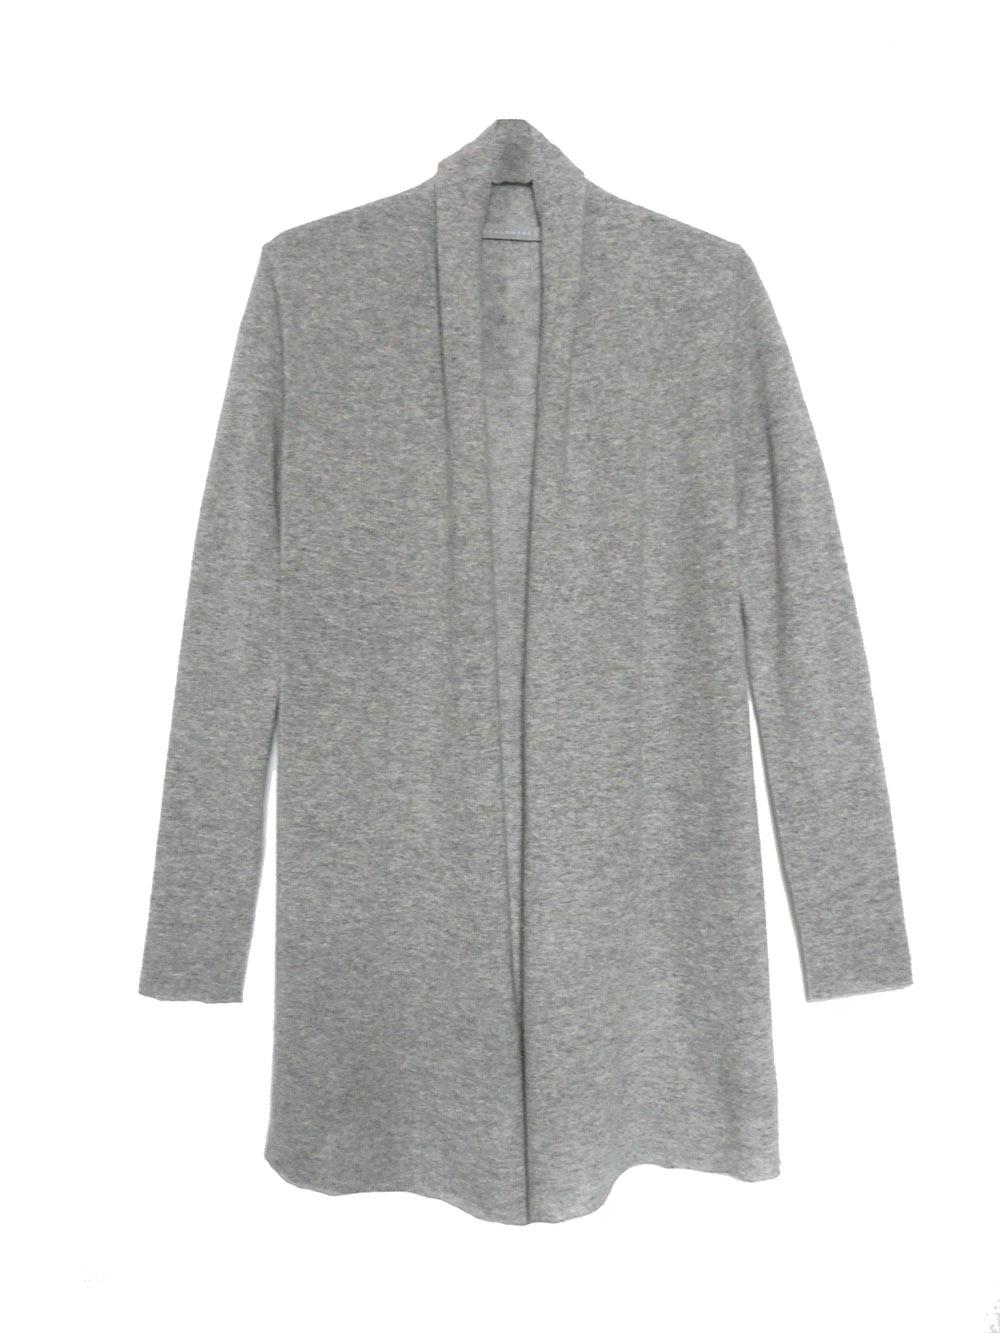 knit open cashmere grey.jpg